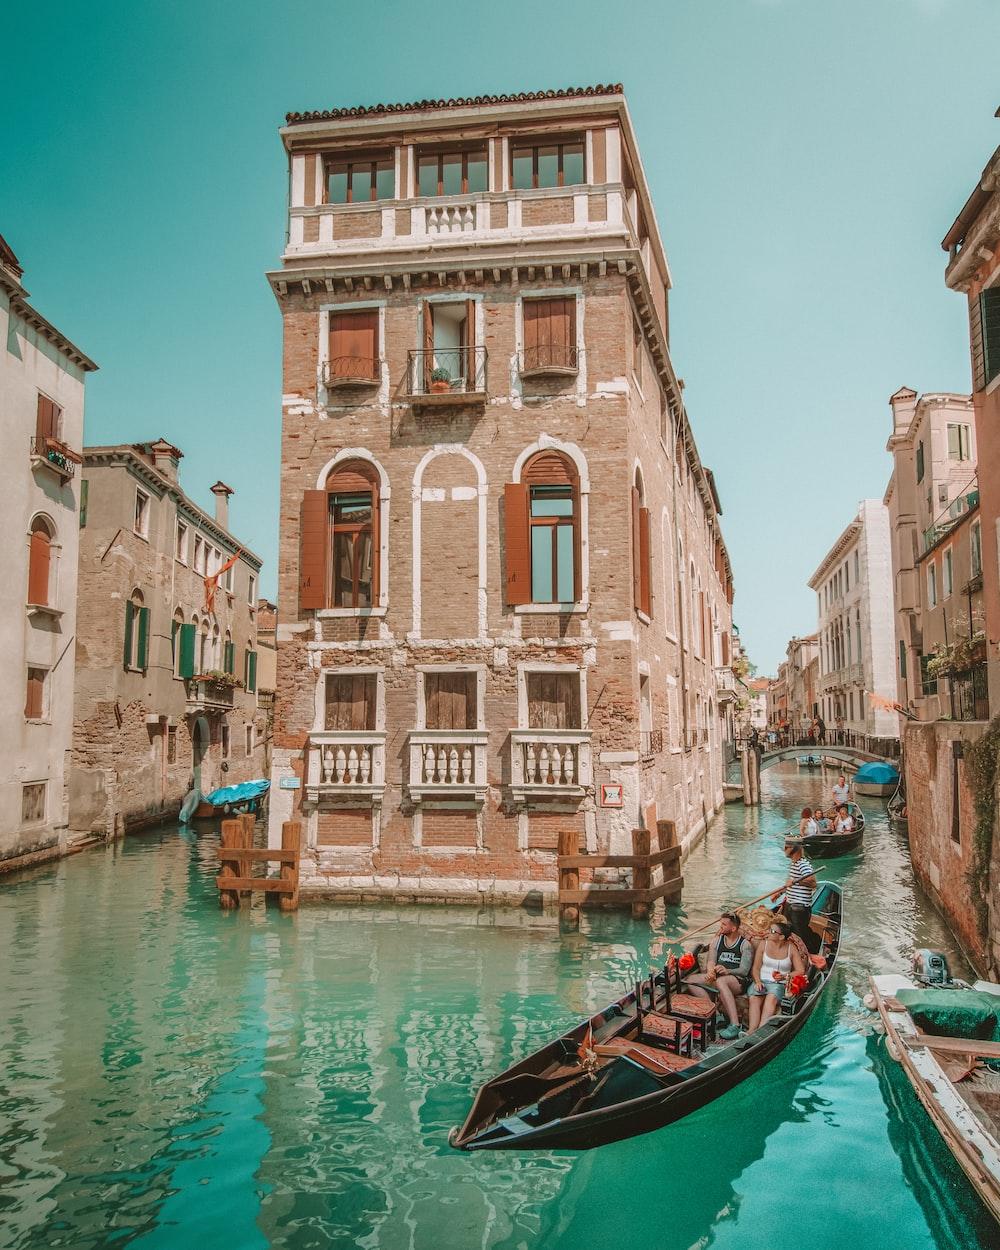 brown boat on water near buildings